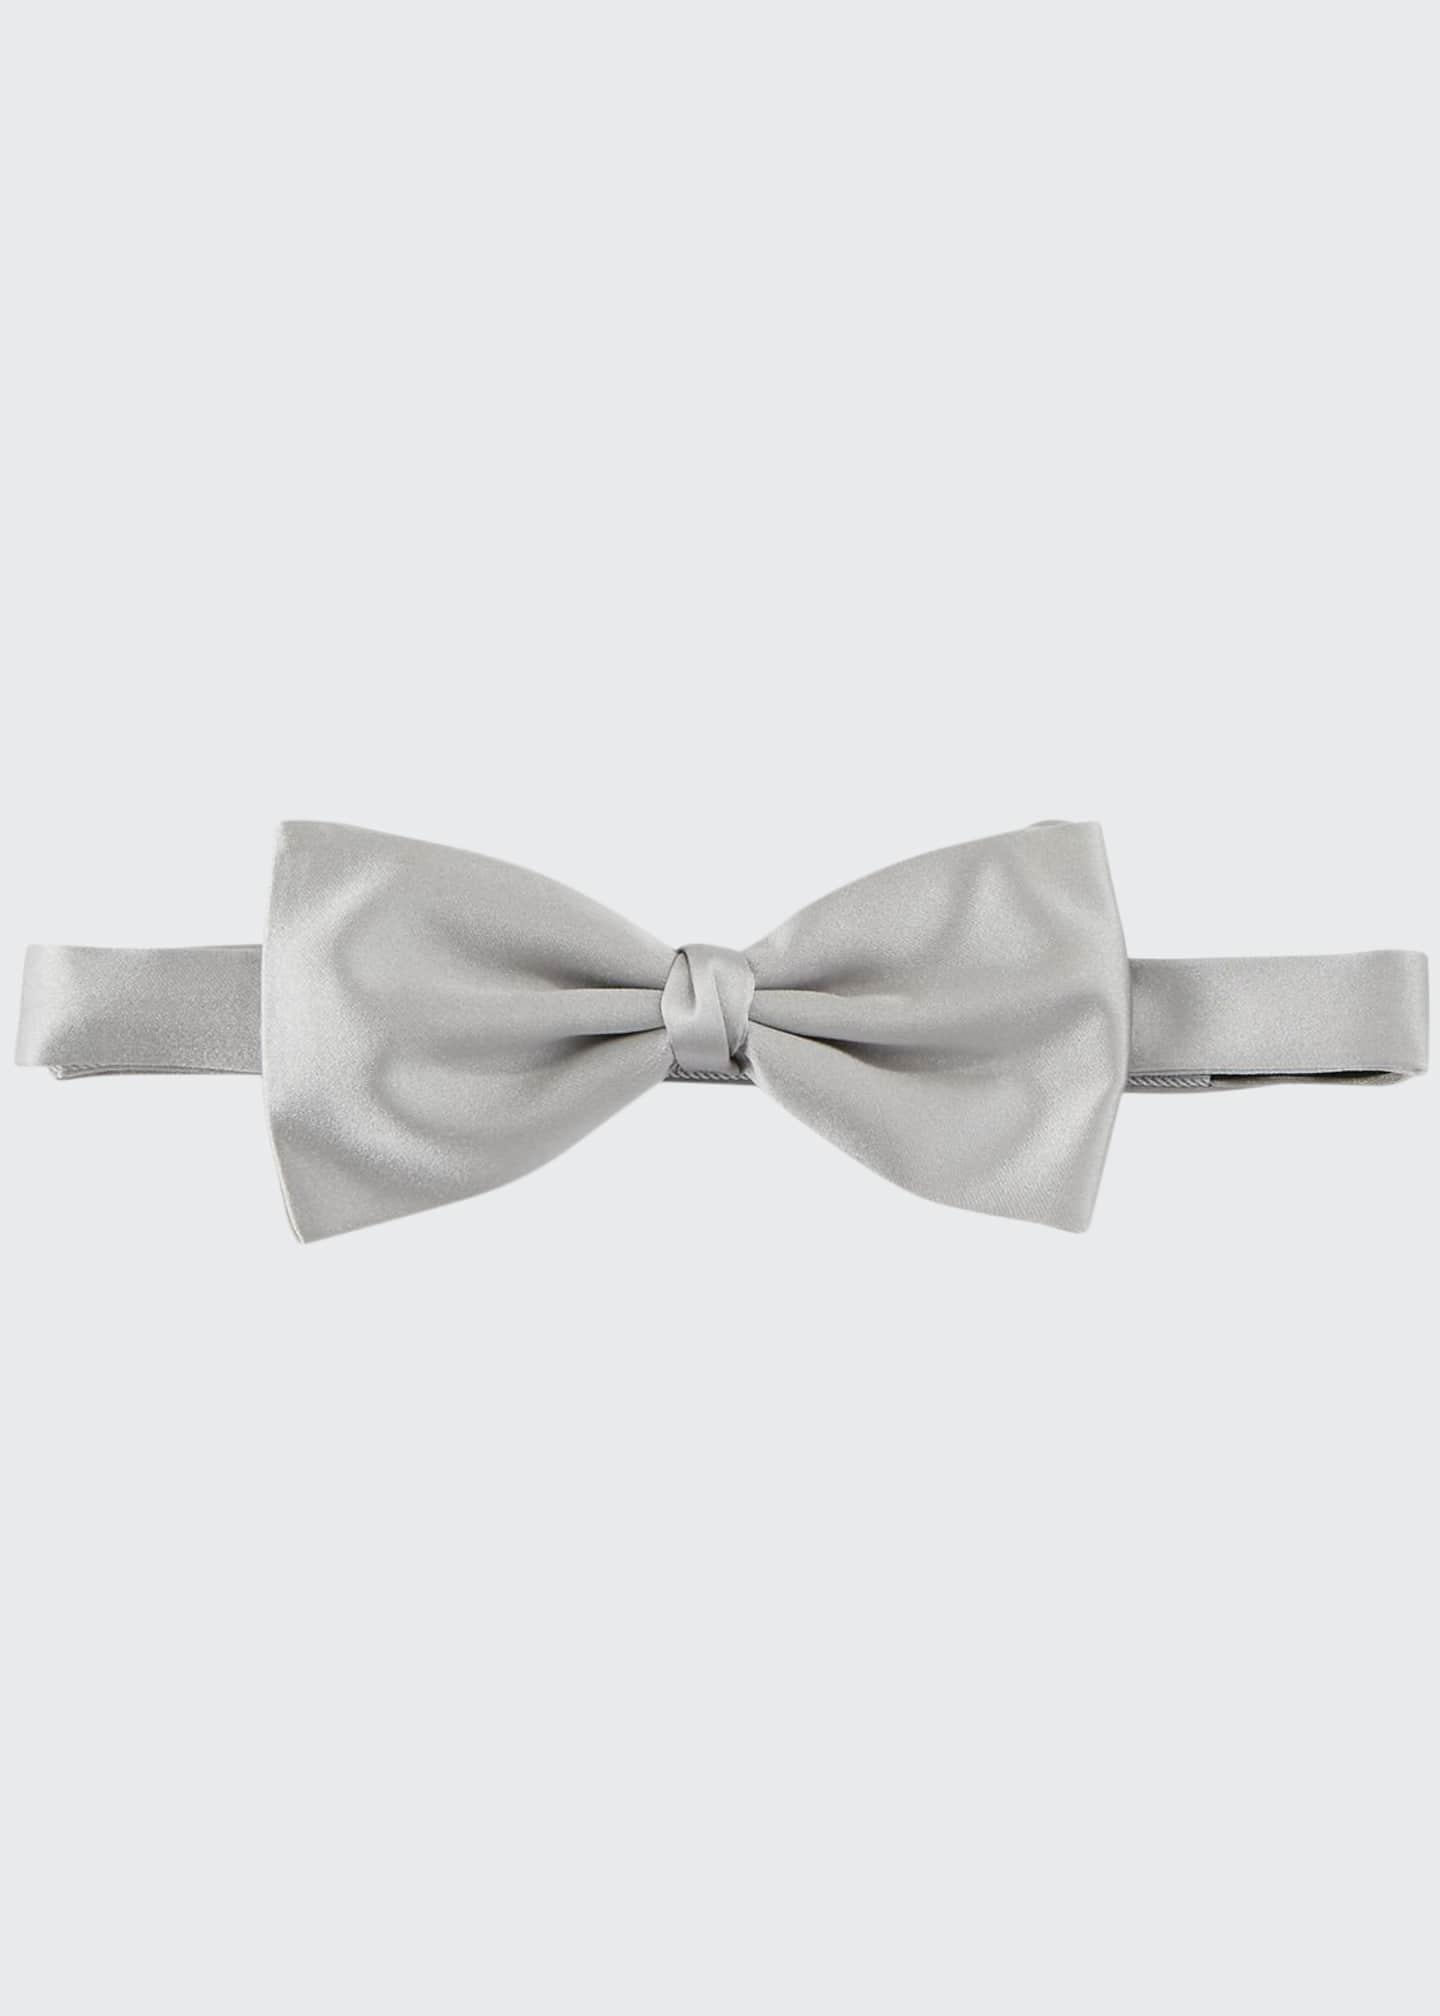 Ermenegildo Zegna Self-Tie Silk Satin Bow Tie